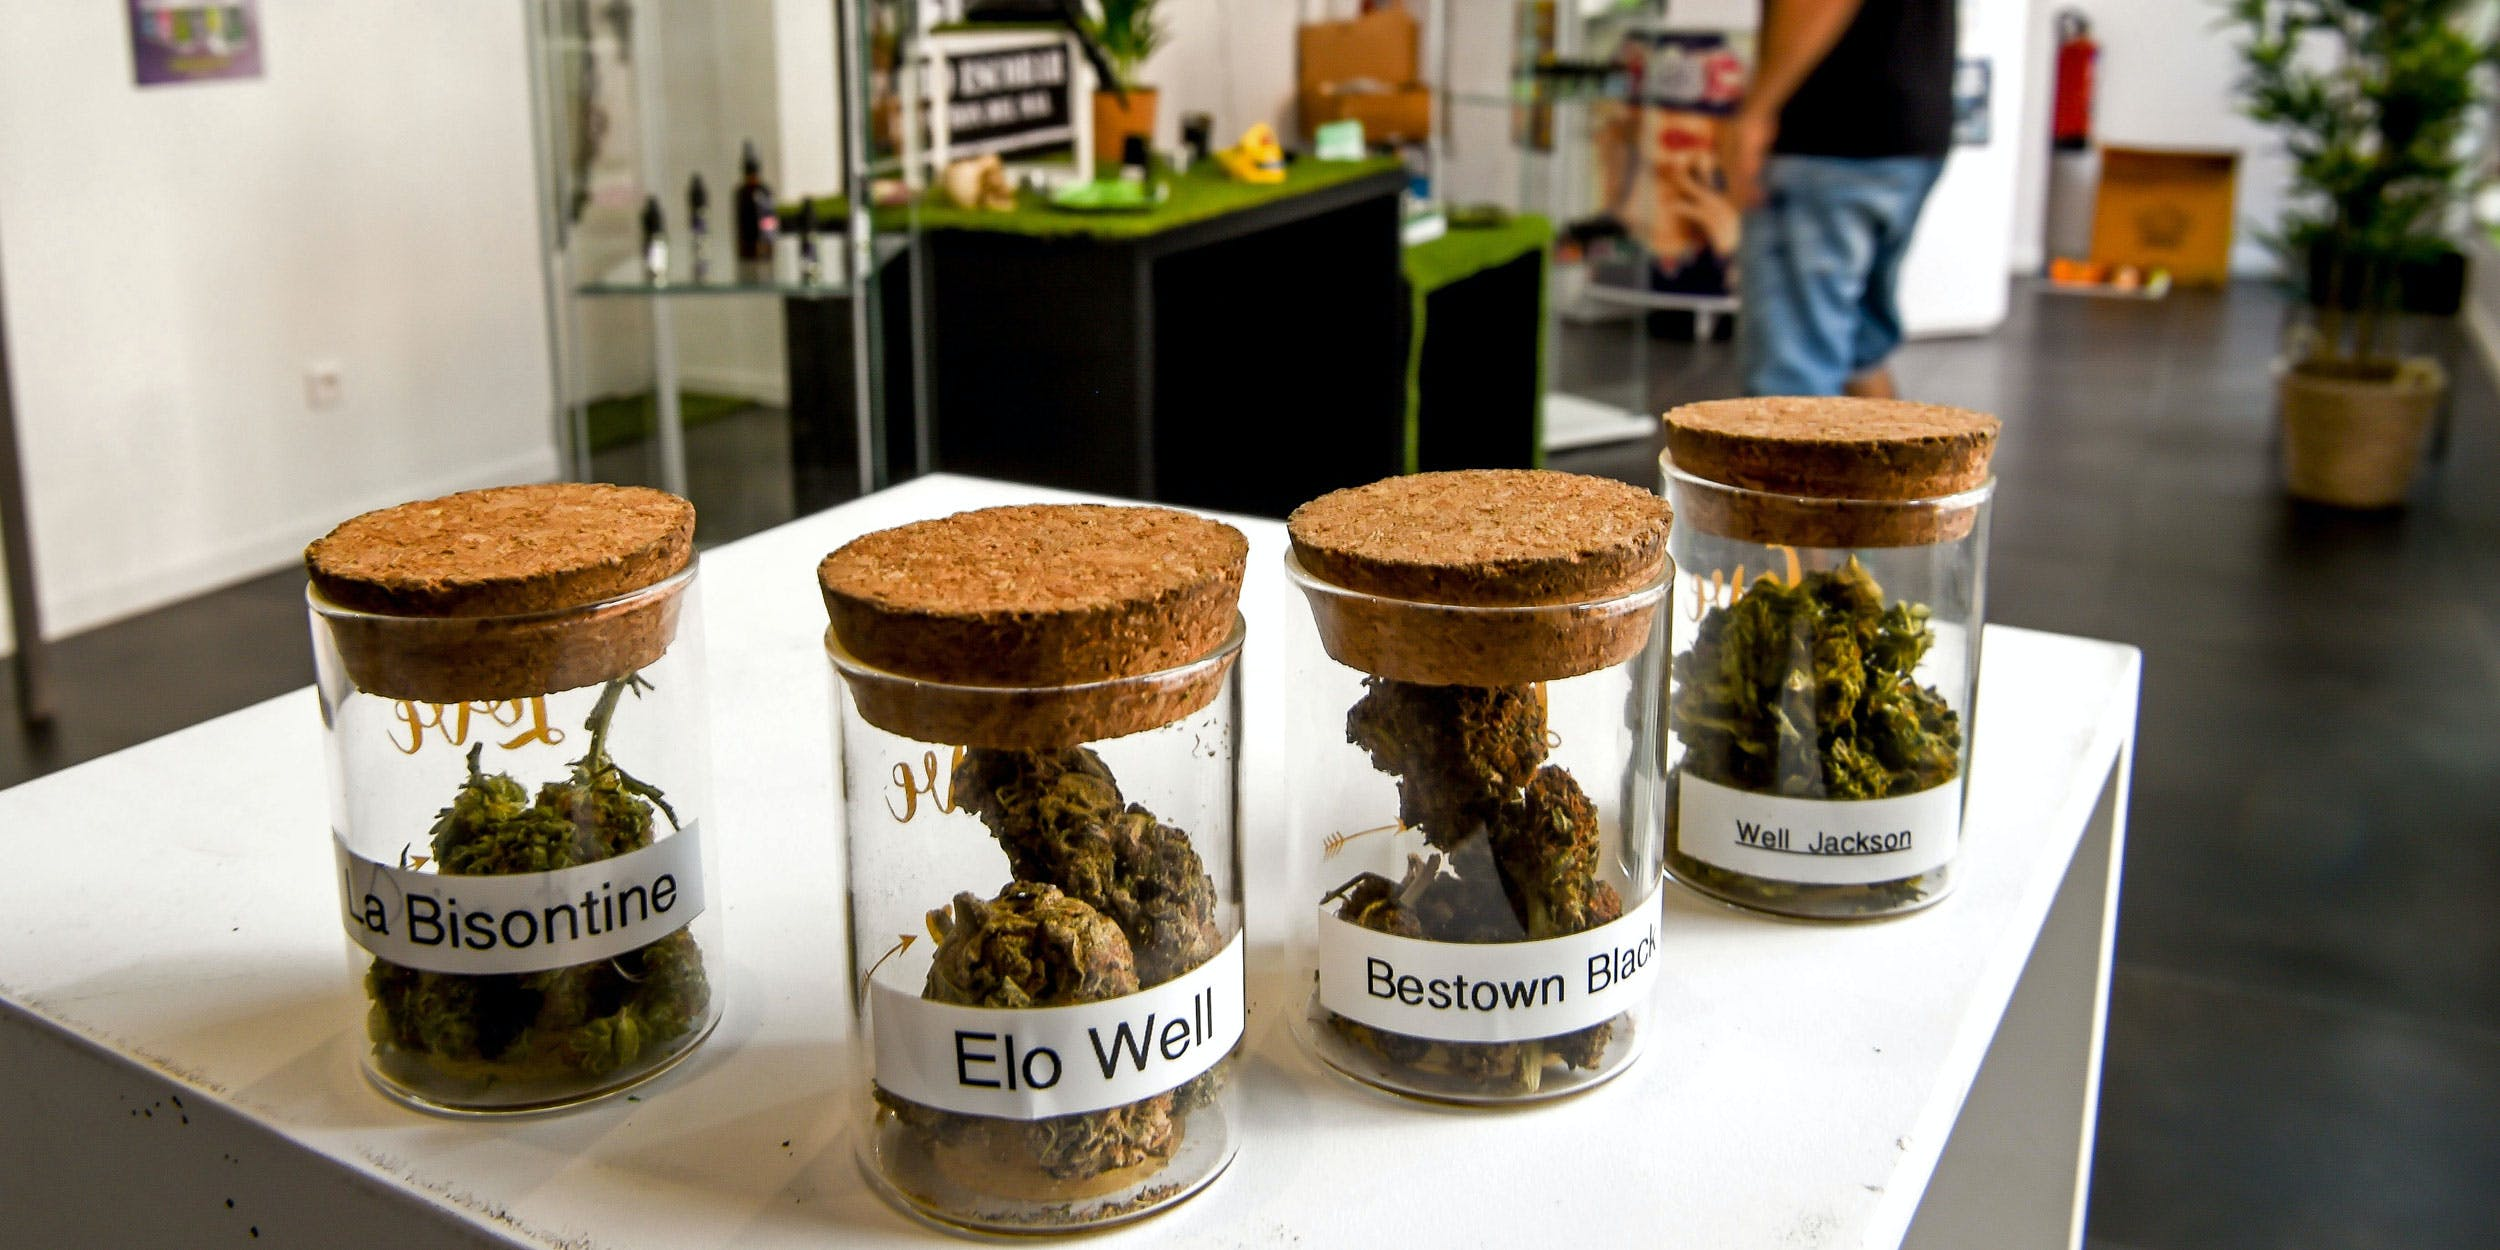 Paris Cannabis Cafe